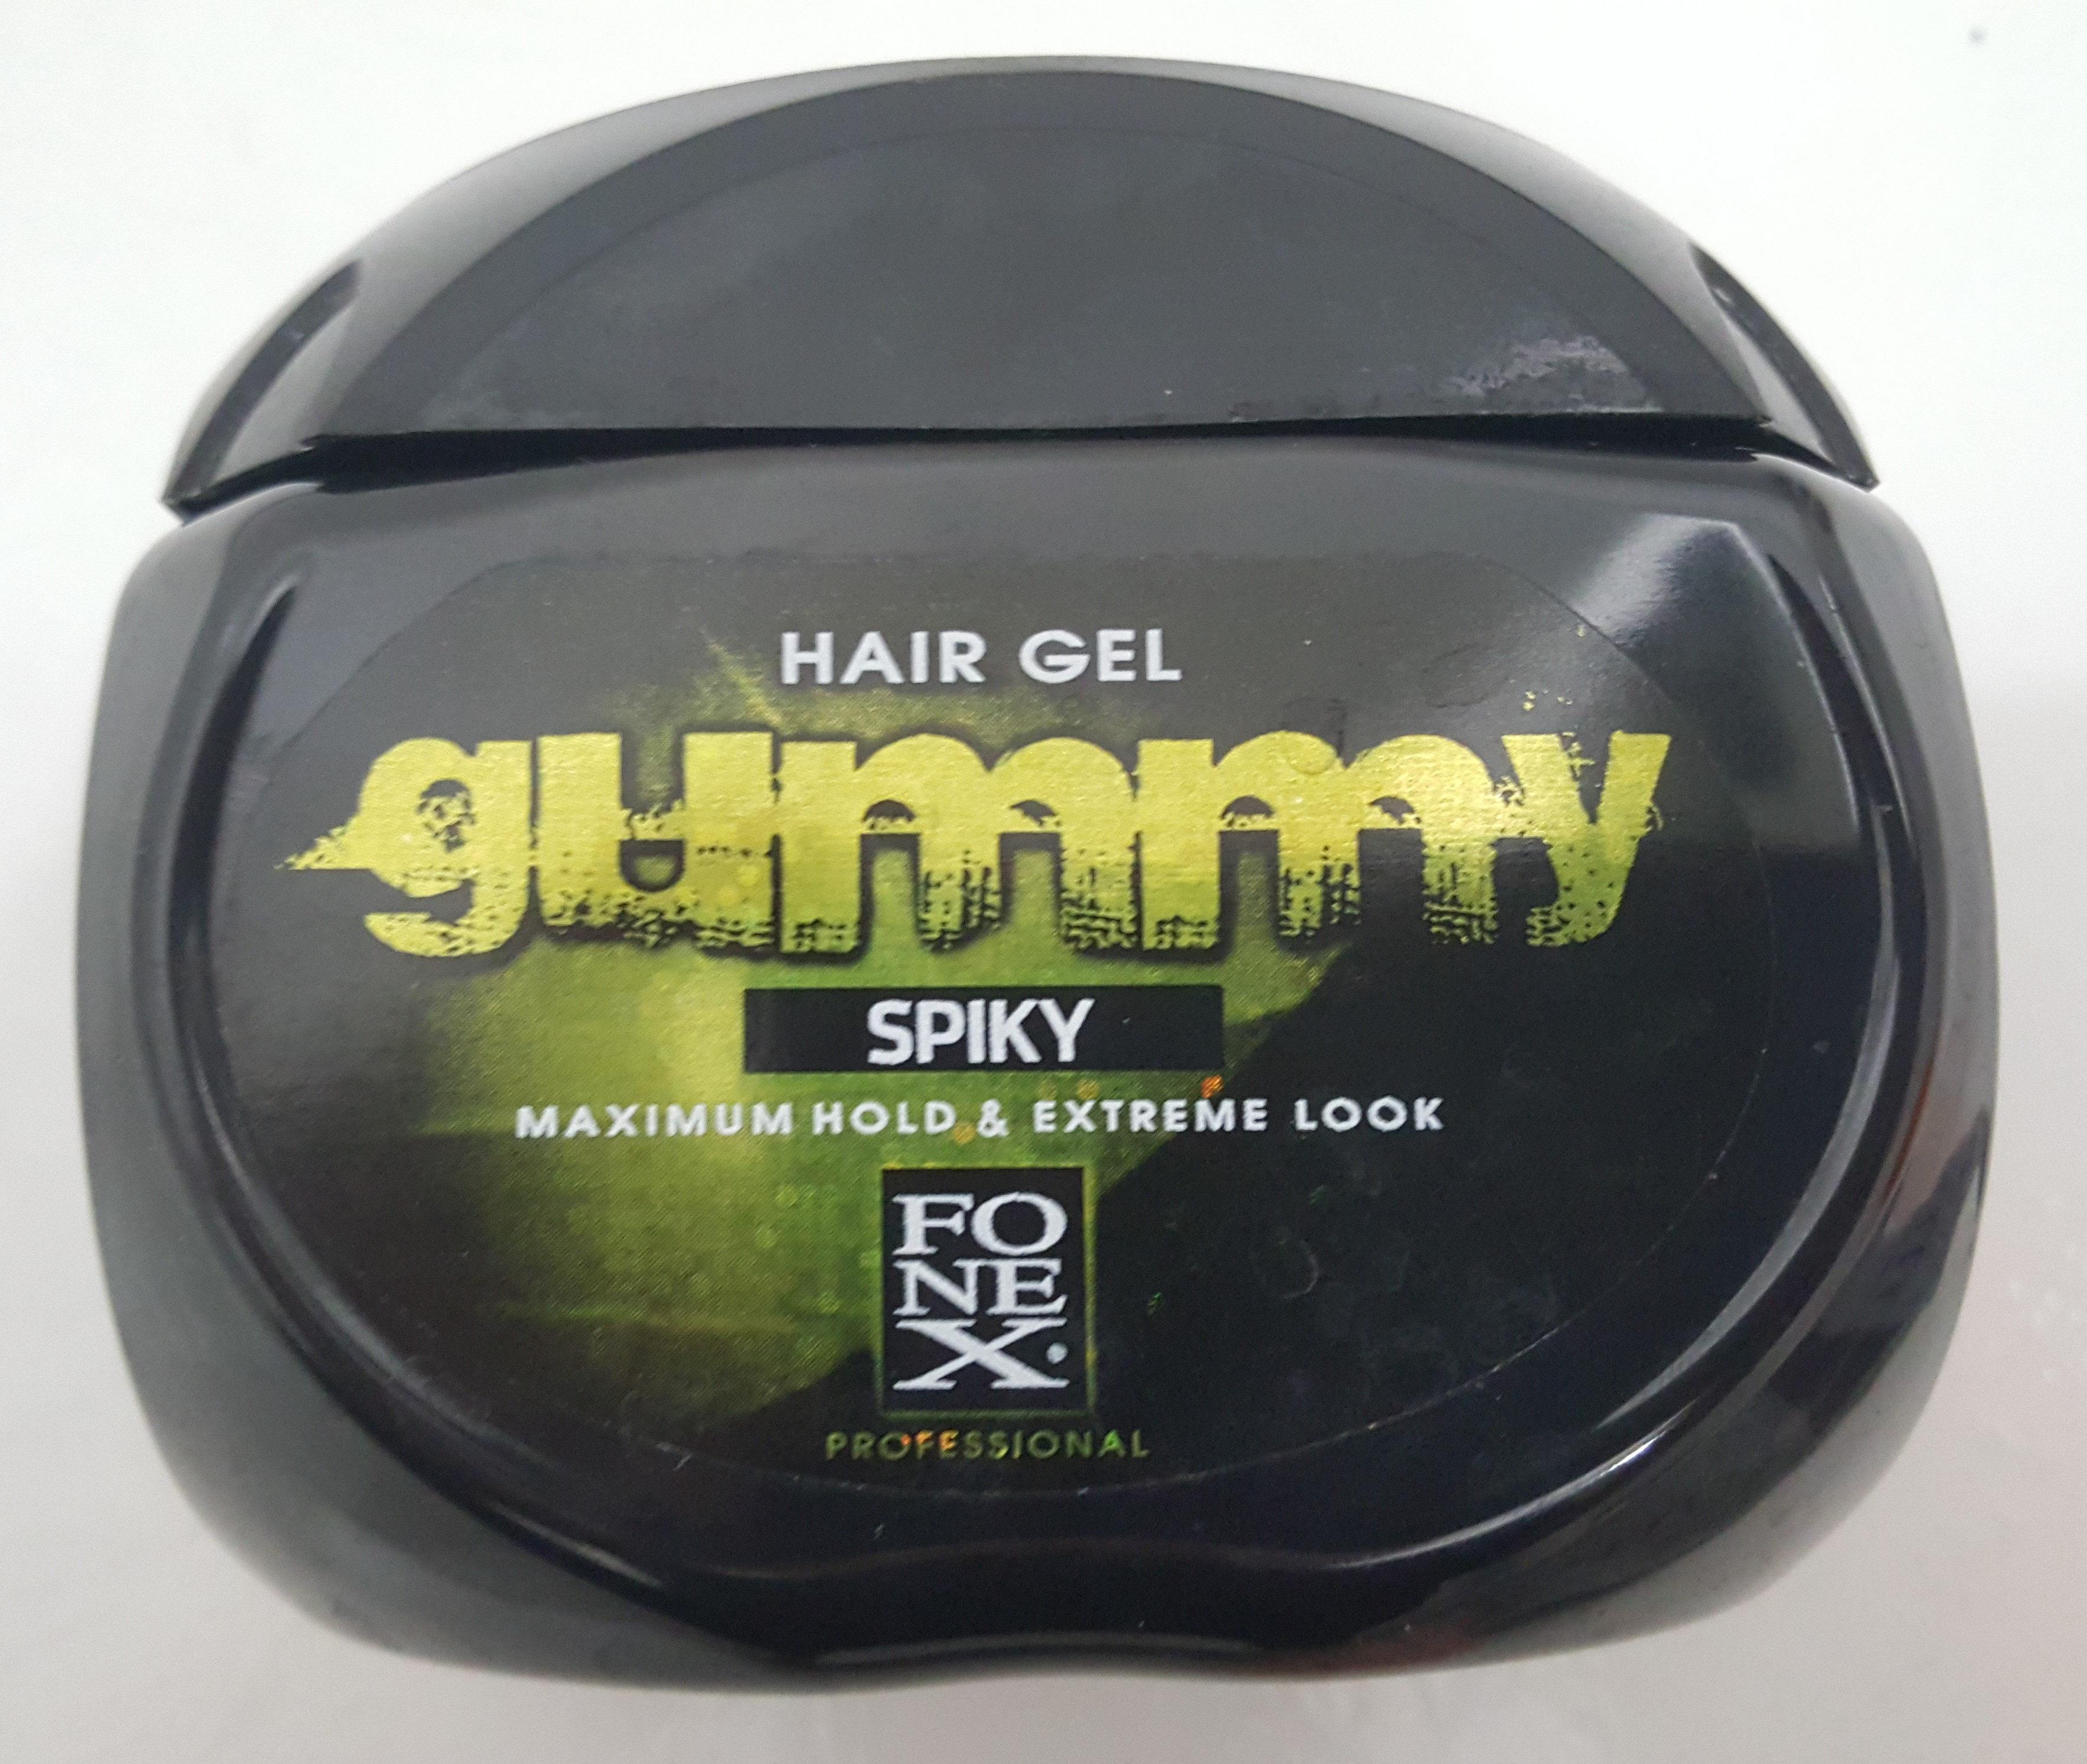 Hair gel GUMMY Spiky - Produit - en